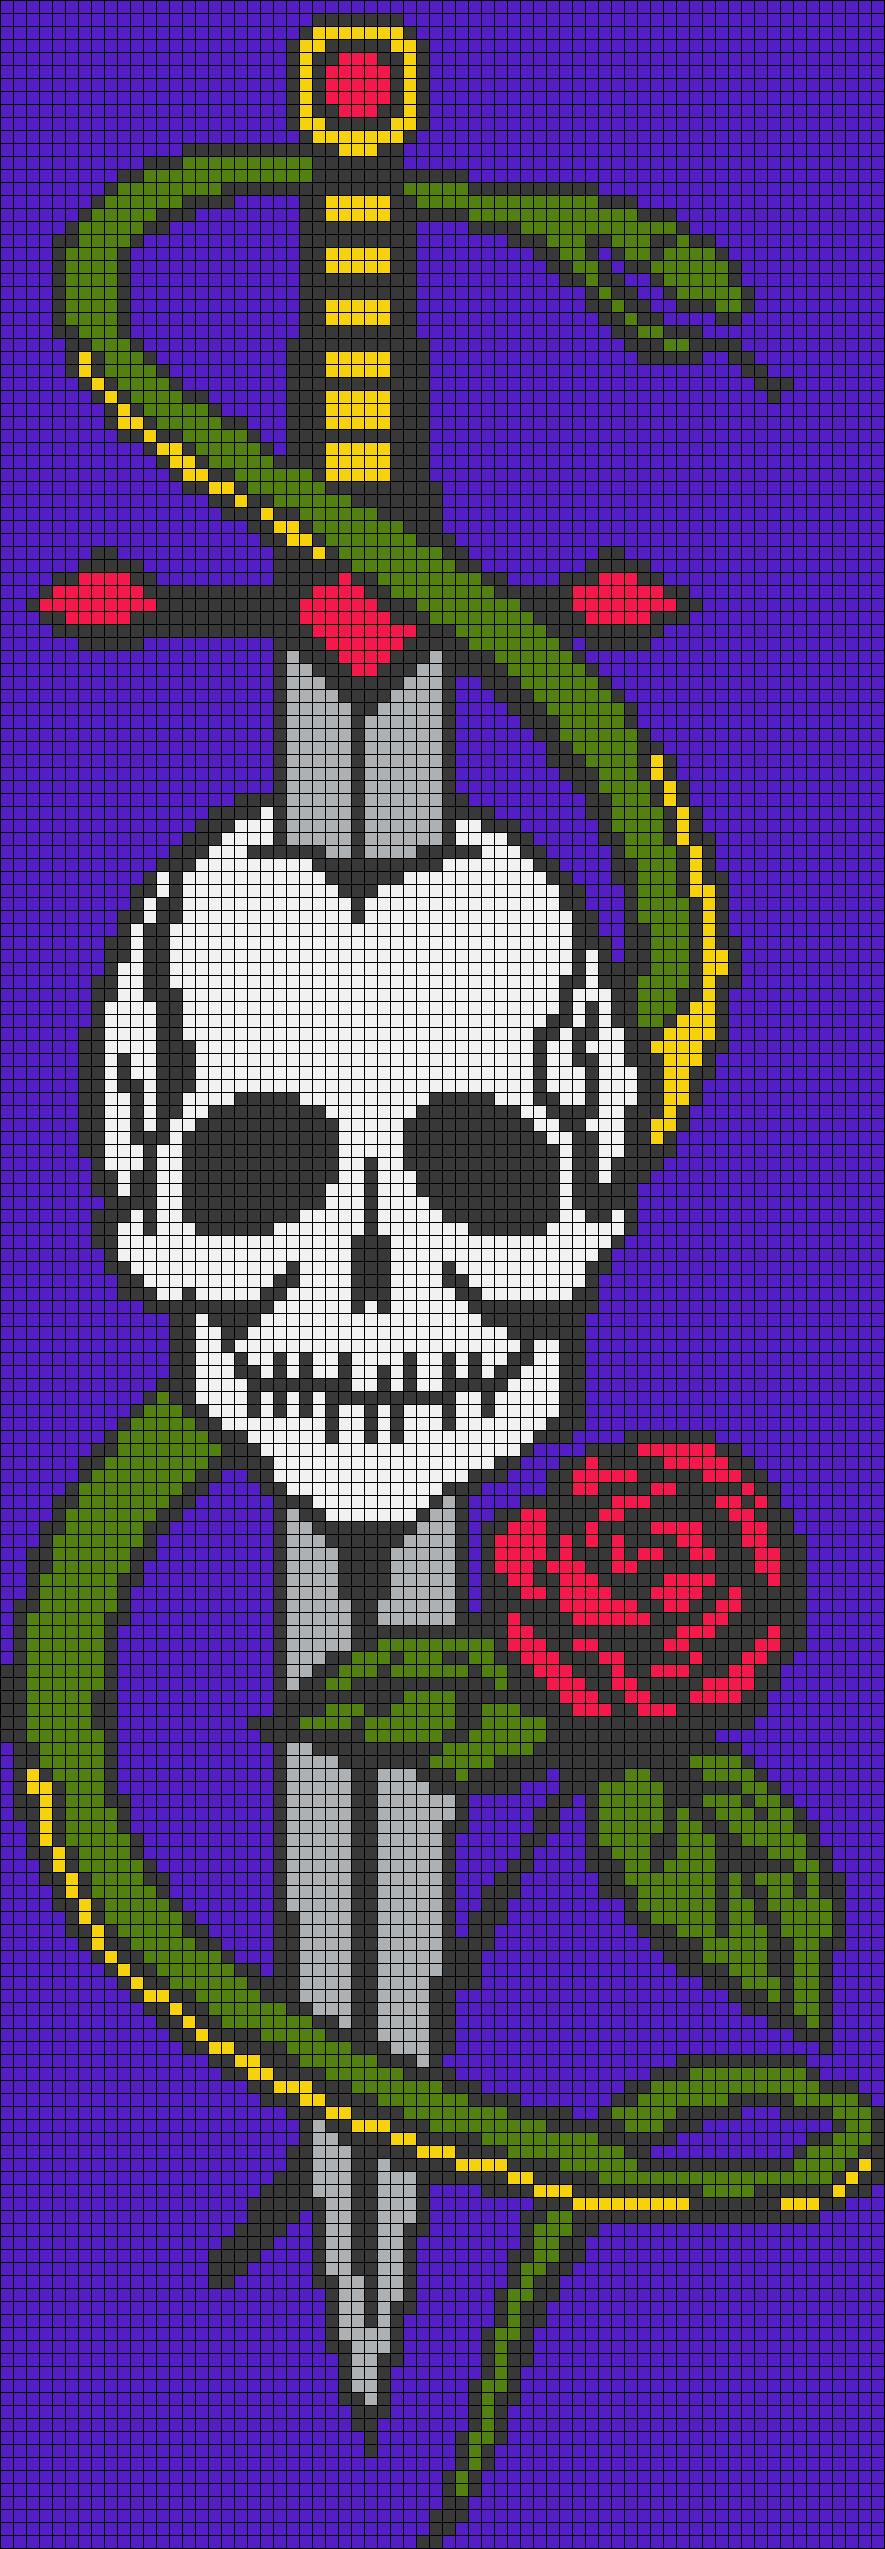 Pixel Art Grid Hard : pixel, Tattoo, Alpha, Friendship, Bracelet, Pattern, #19817, BraceletBook.com, Minecraft, Pixel, Maker, Anime, Ideas, Eas…, Grid,, Templates,